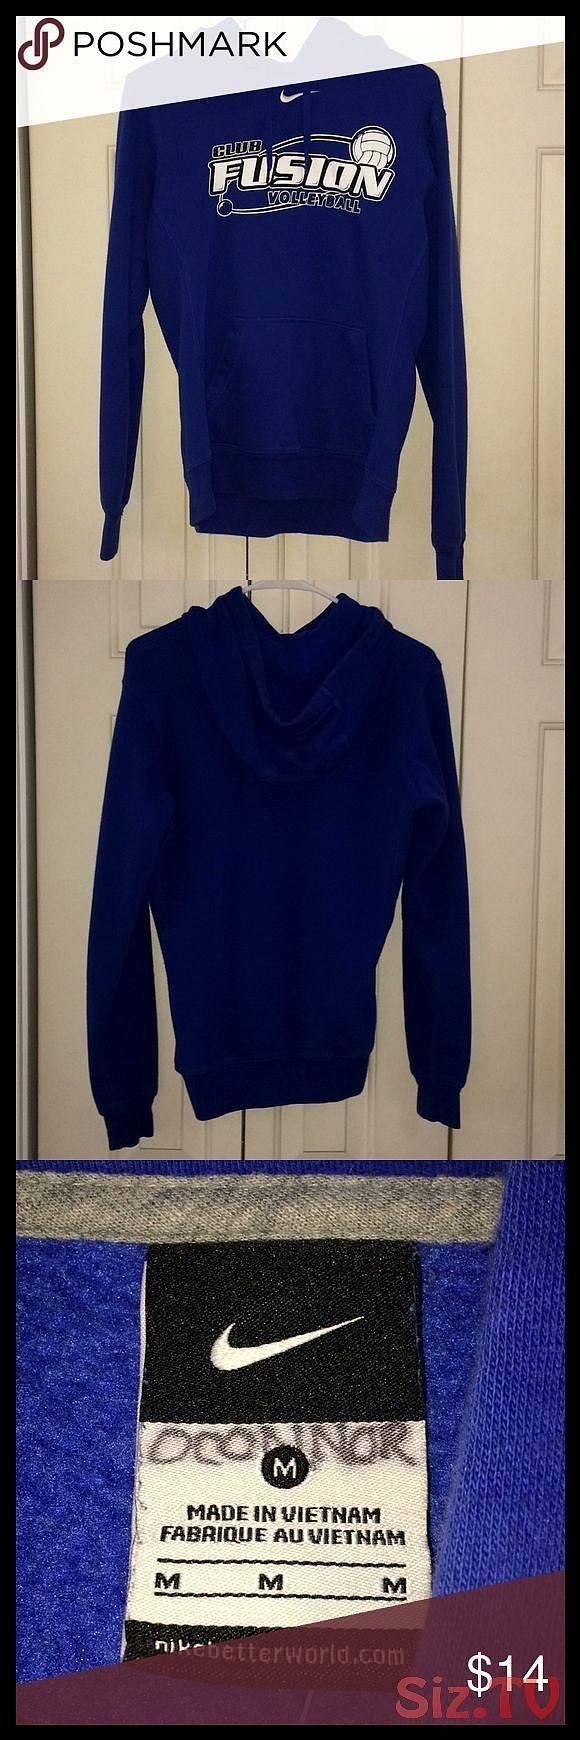 Fusion Nike Sweatshirt Fusion Volleyball Club Sweatshirt Super Comfortable 038 Great Quality No Signs Of Wear Club Sweatshirts Sweatshirts Nike Sweatshirts